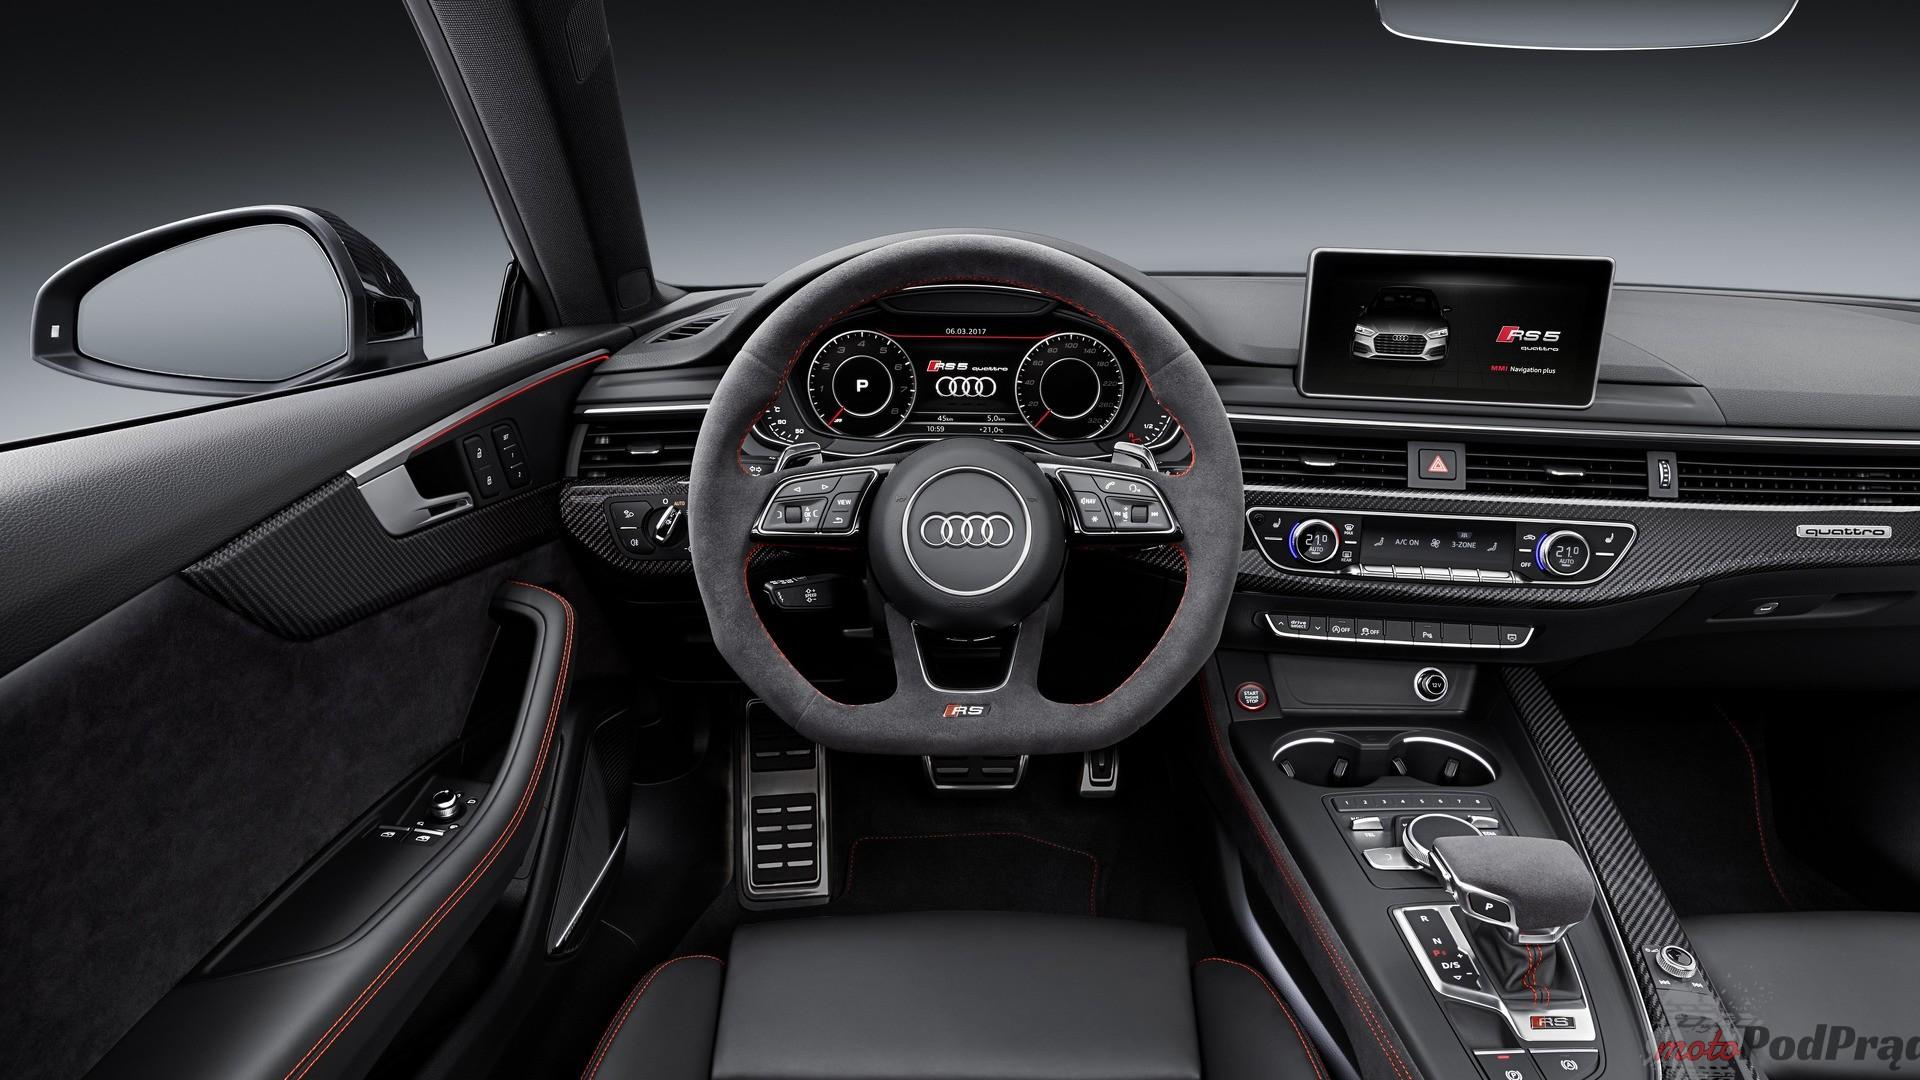 2018 audi rs5 coupe 1 Odszedł król, niech żyje król   Audi RS5 Coupe